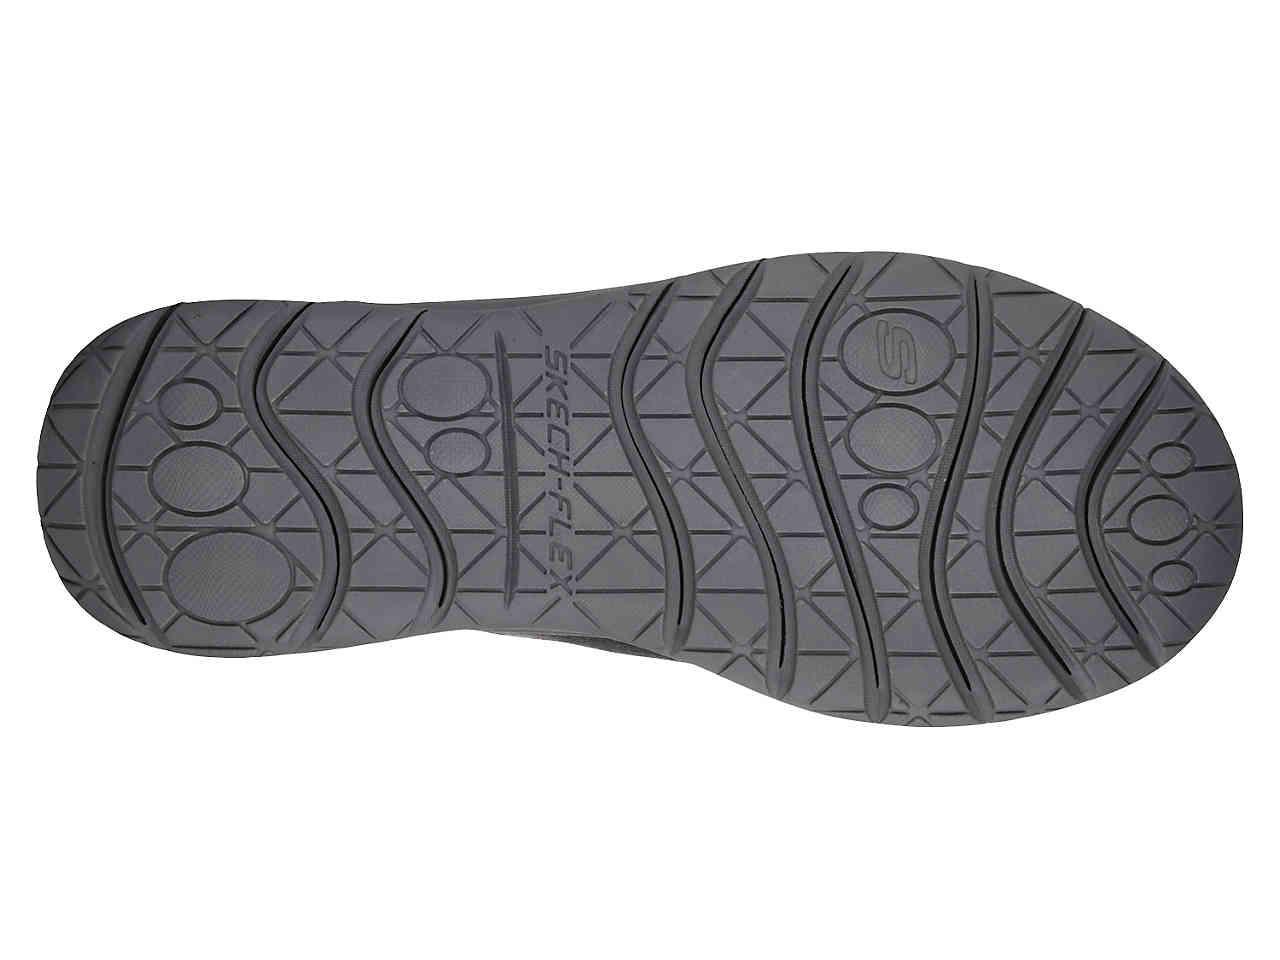 7de3fa66881 Lyst - Skechers Superior 2.0 Vorado Slip-on in Black for Men